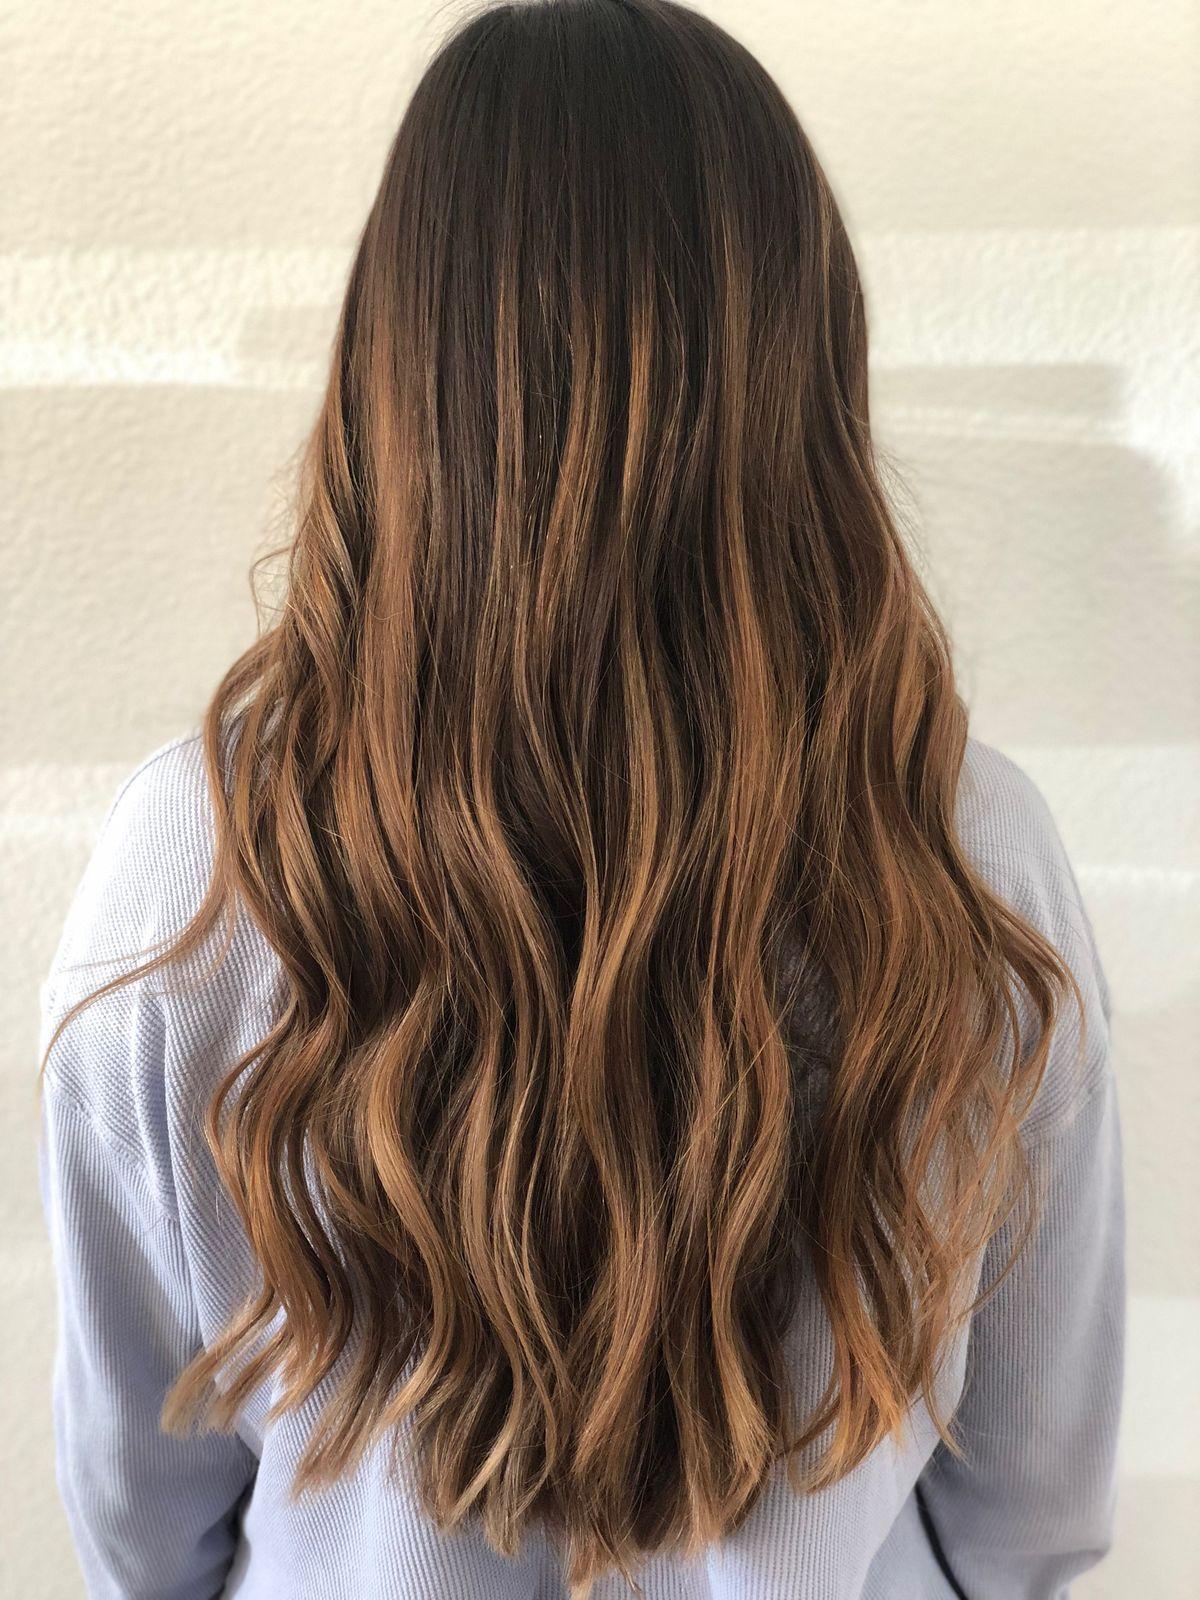 Hair Inspiration 2019-07-08 20:52:52